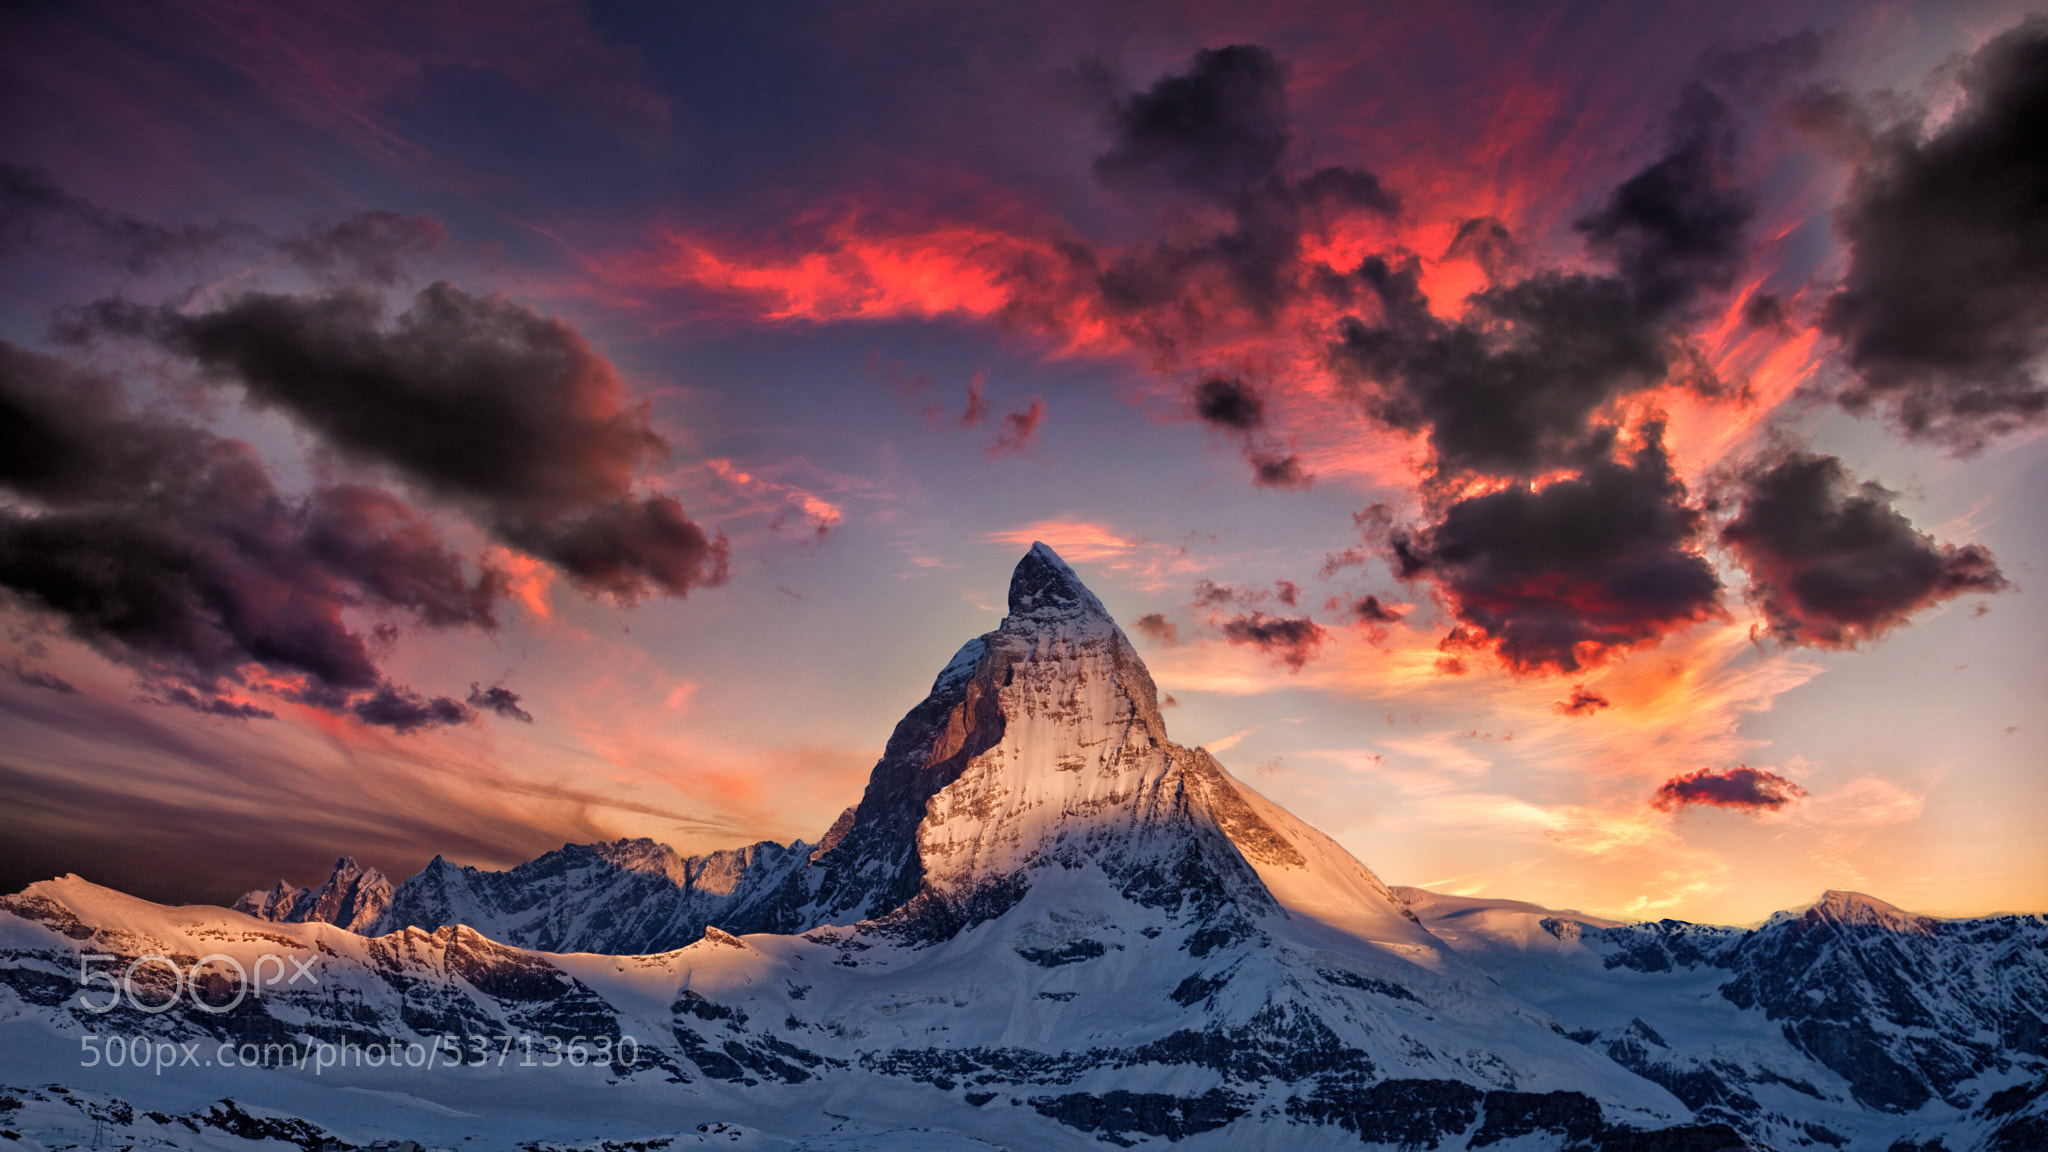 Photograph Amazing Matterhorn by Thomas Fliegner on 500px